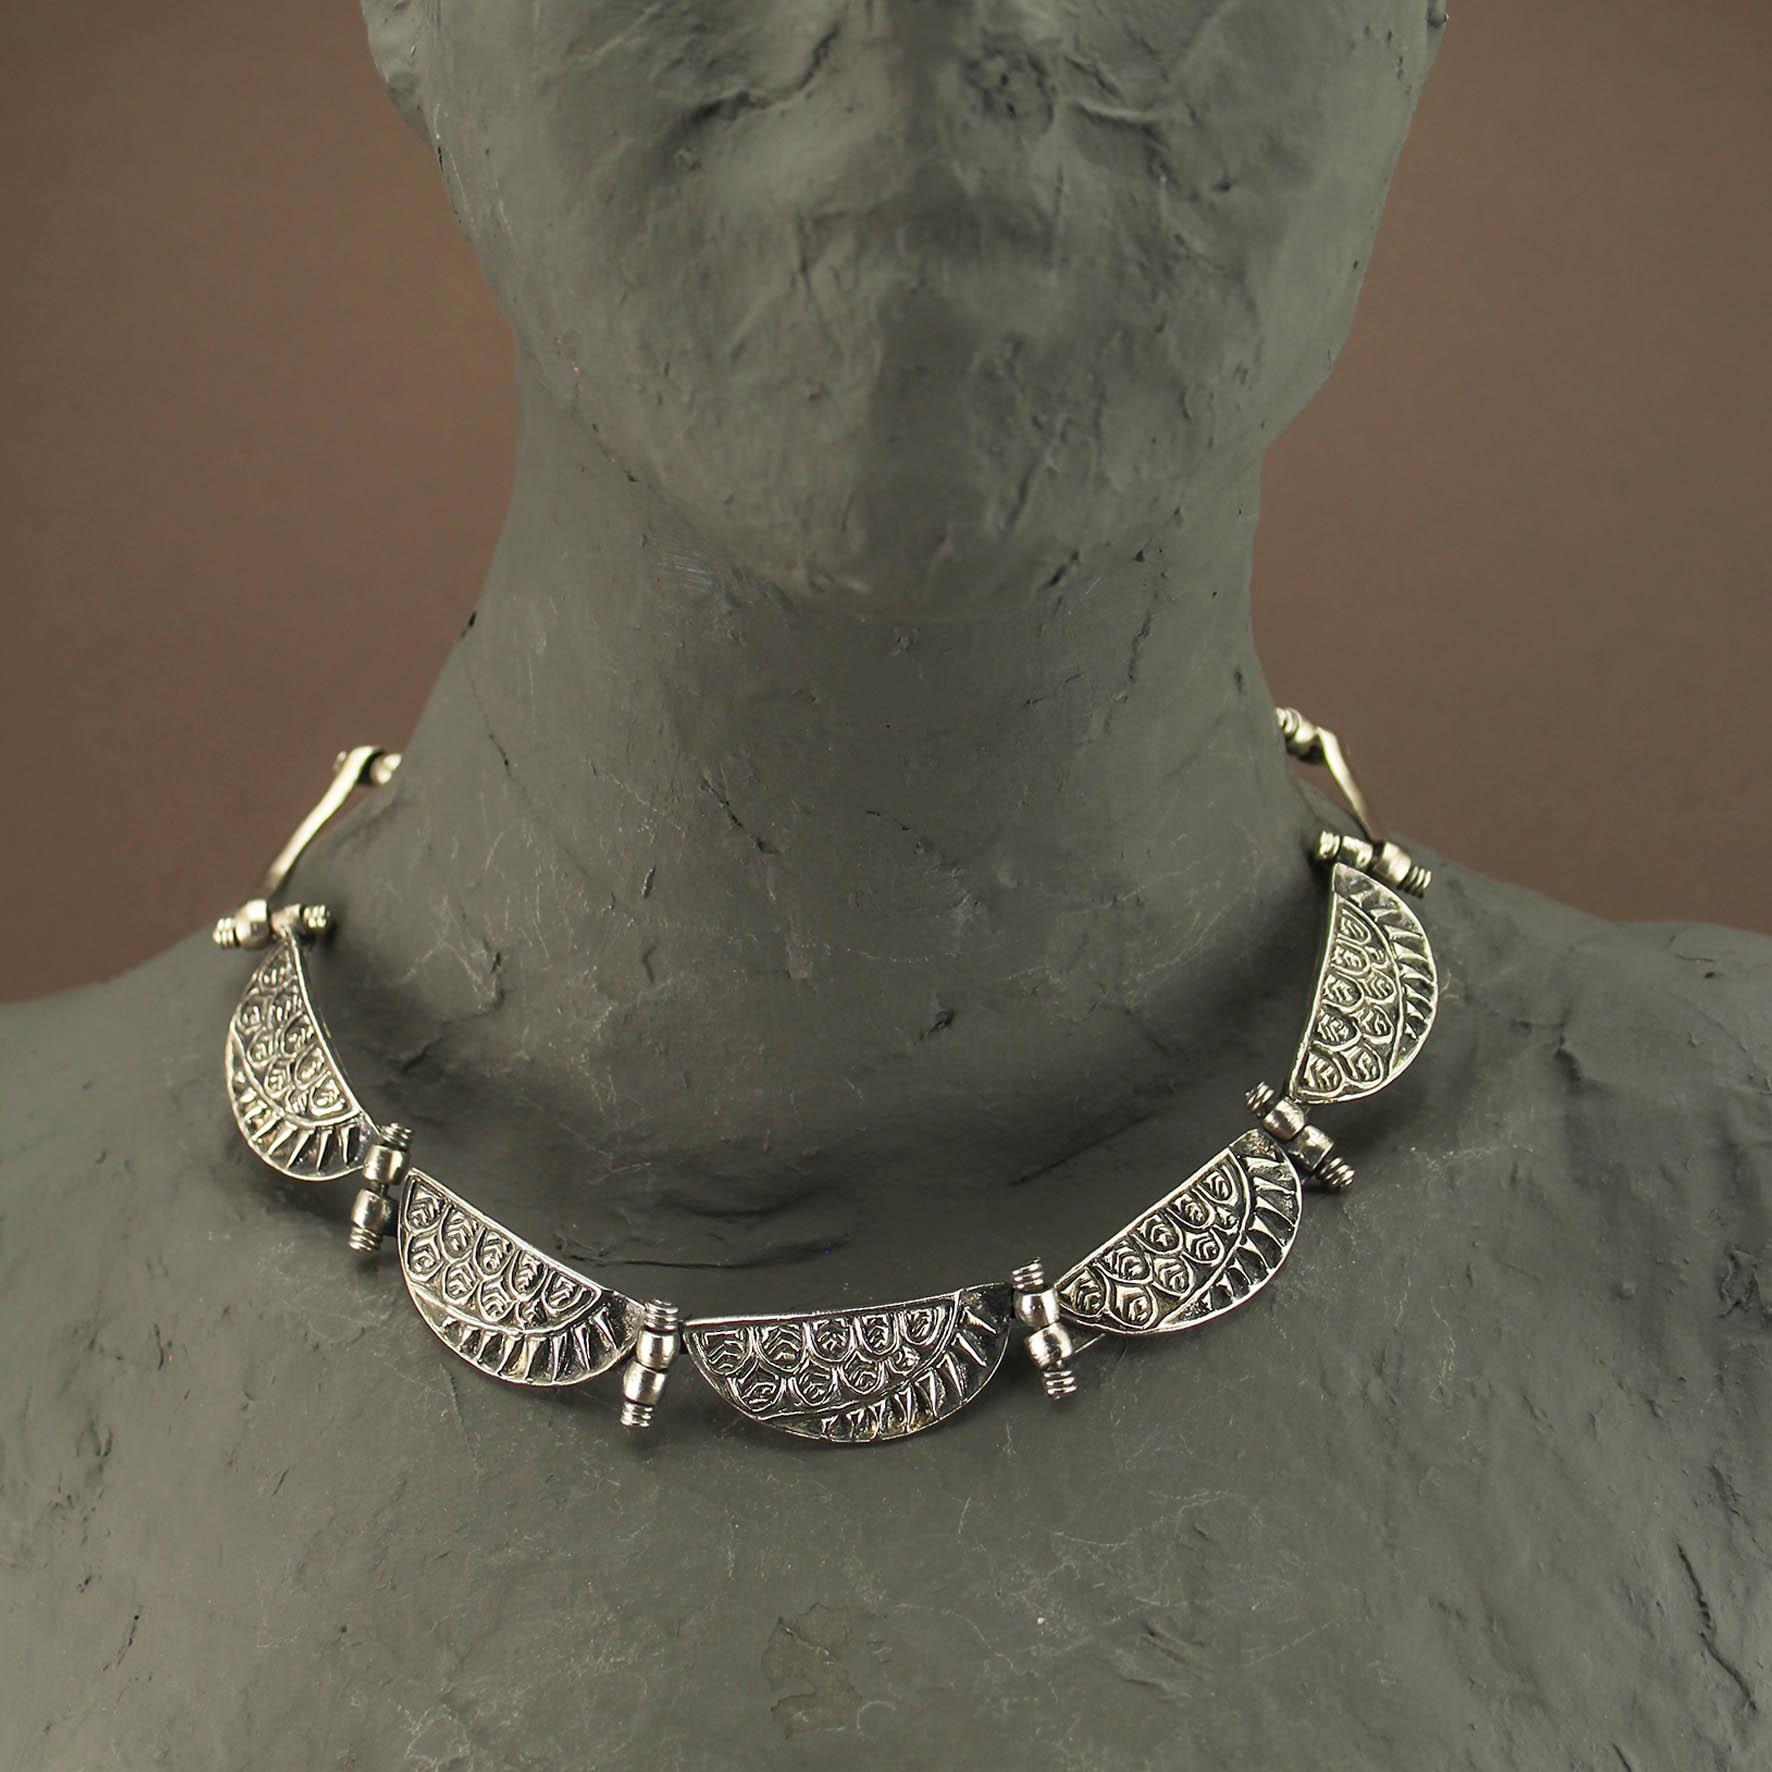 Semicircular Wing Necklace